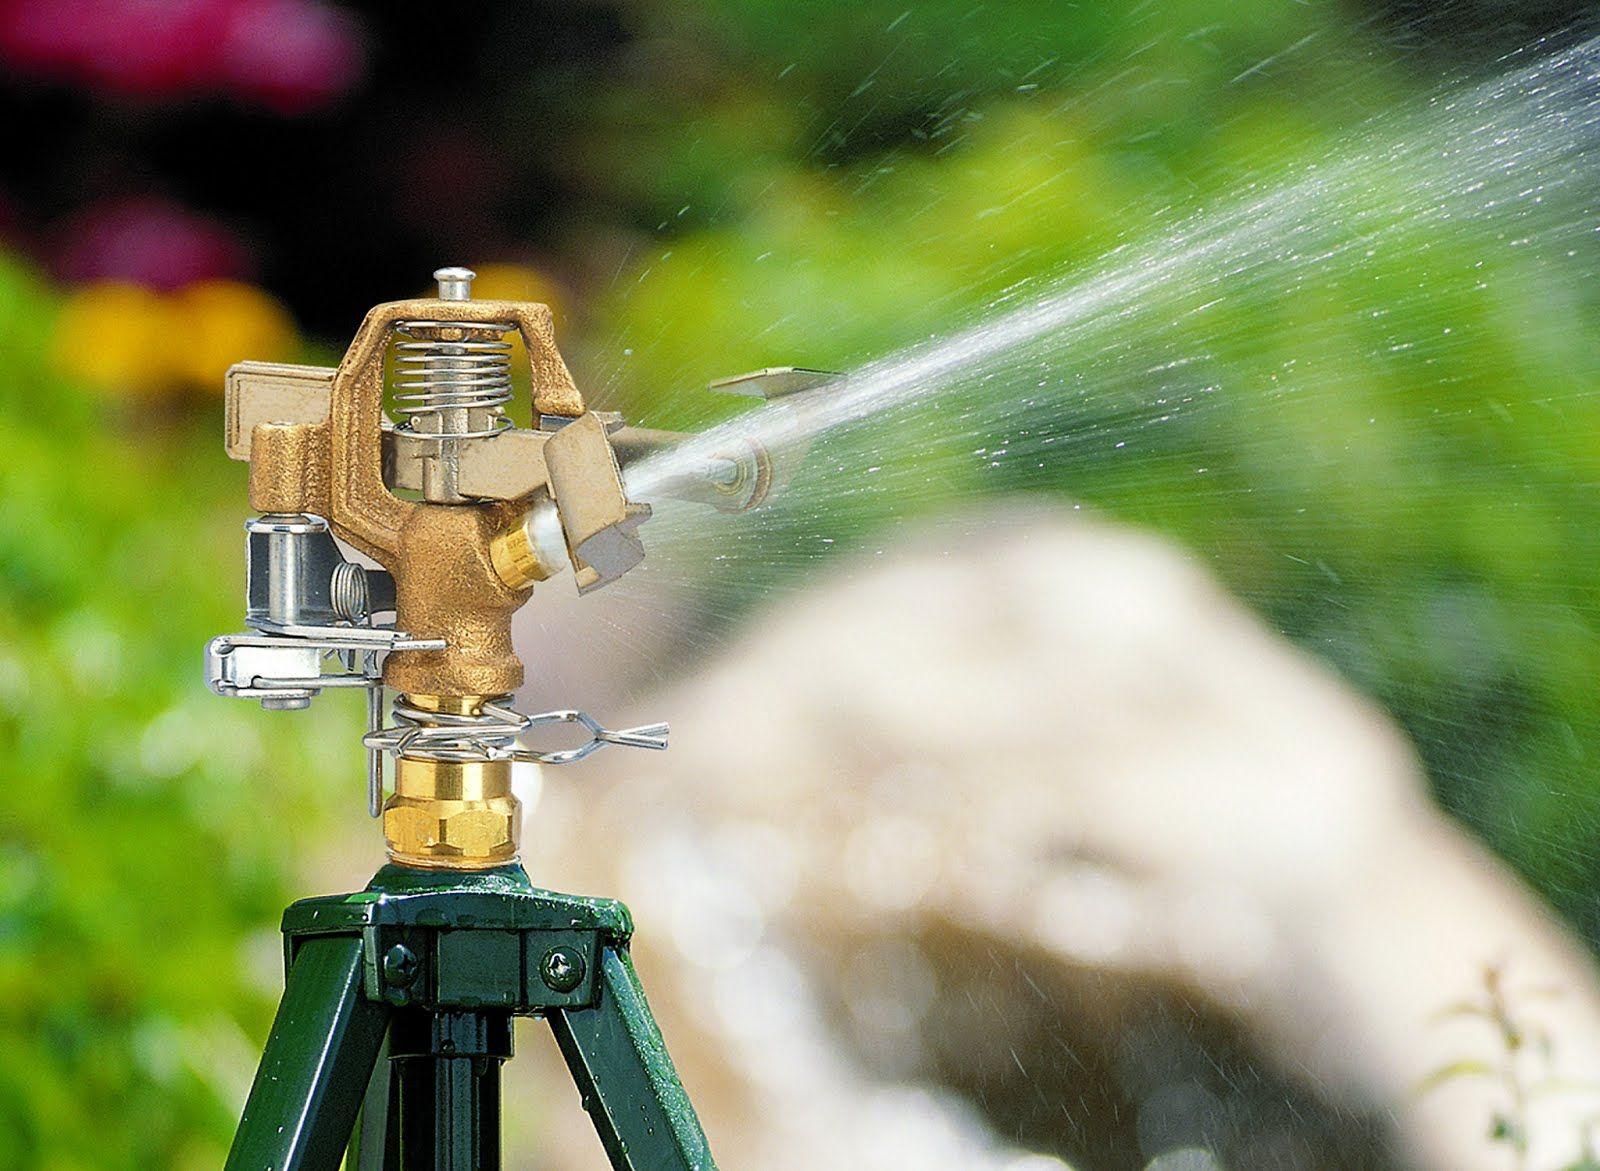 Impact Head Irrigation system diy, Irrigation system